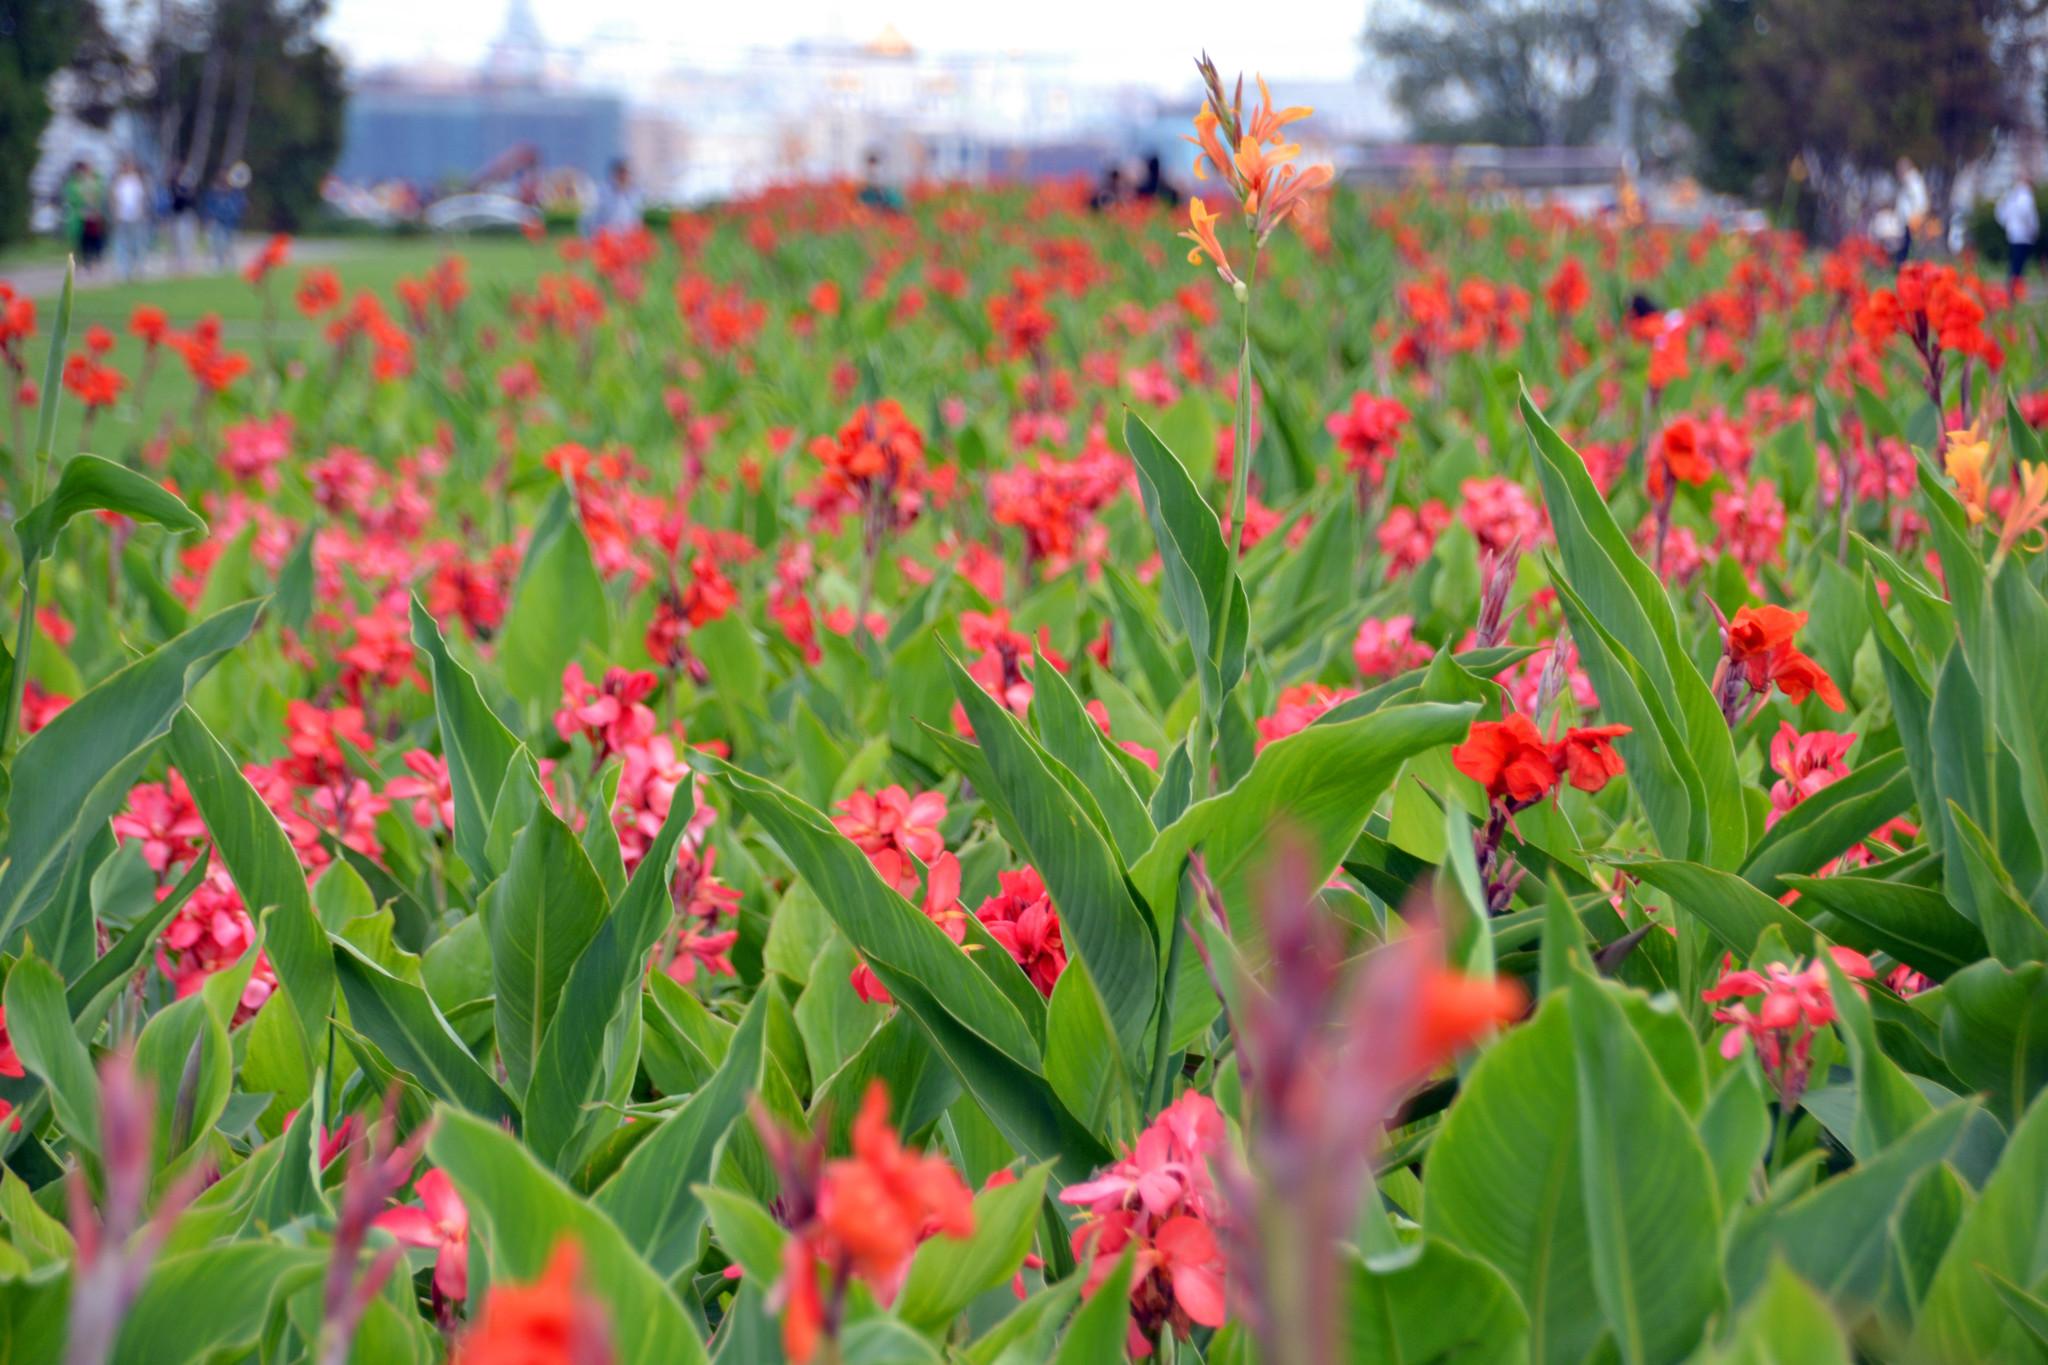 6. Ещё площадь перед Университетом засажена красивыми цветами.